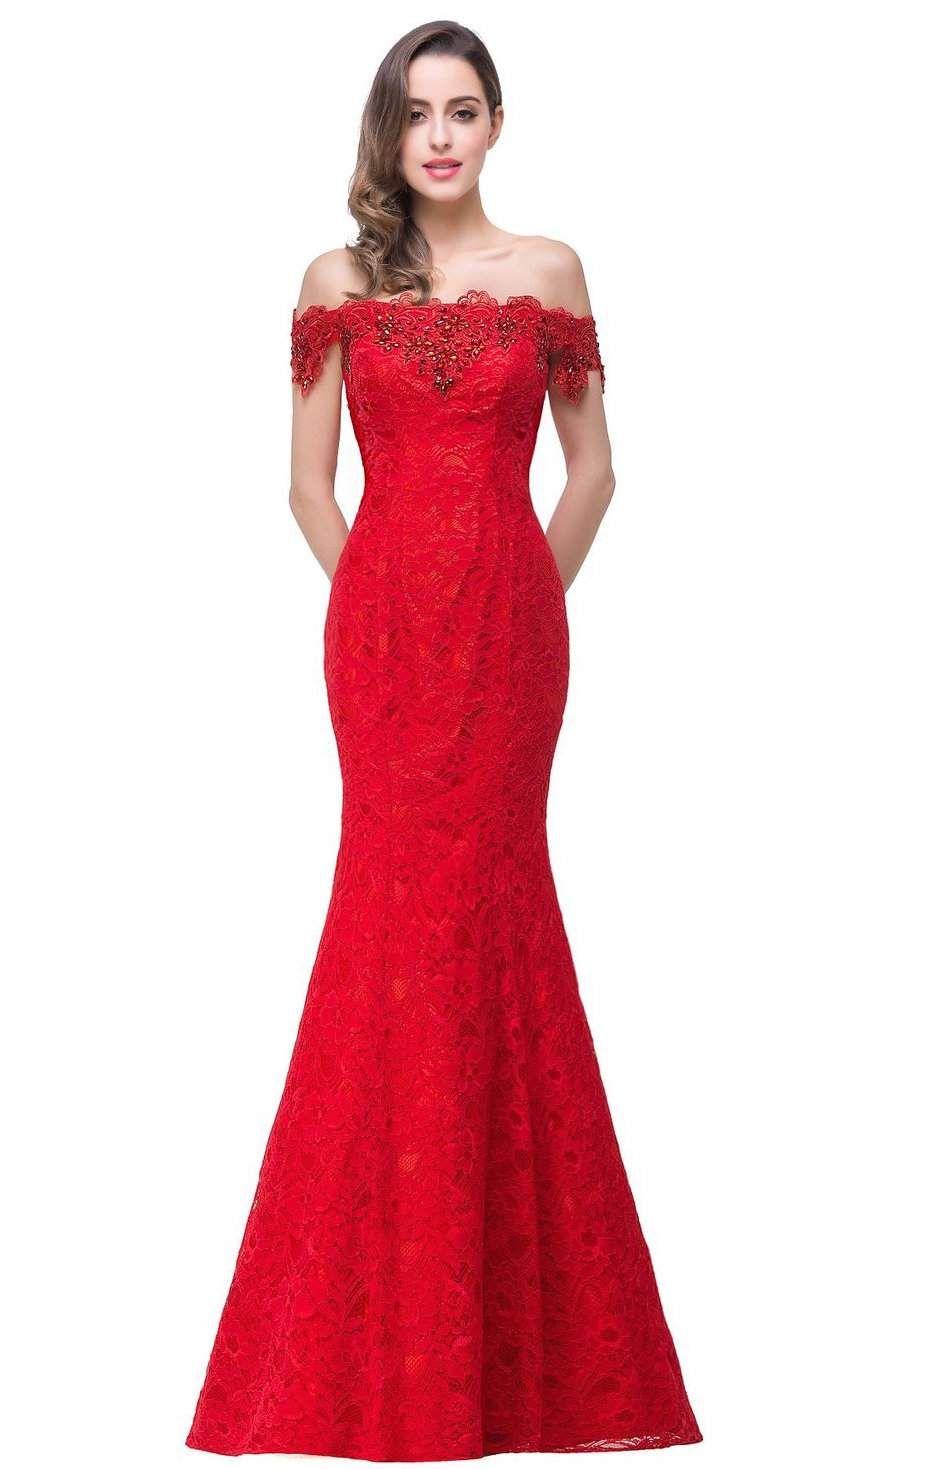 60+ Beautiful Red Wedding Dress Inspiration | Red wedding dresses ...